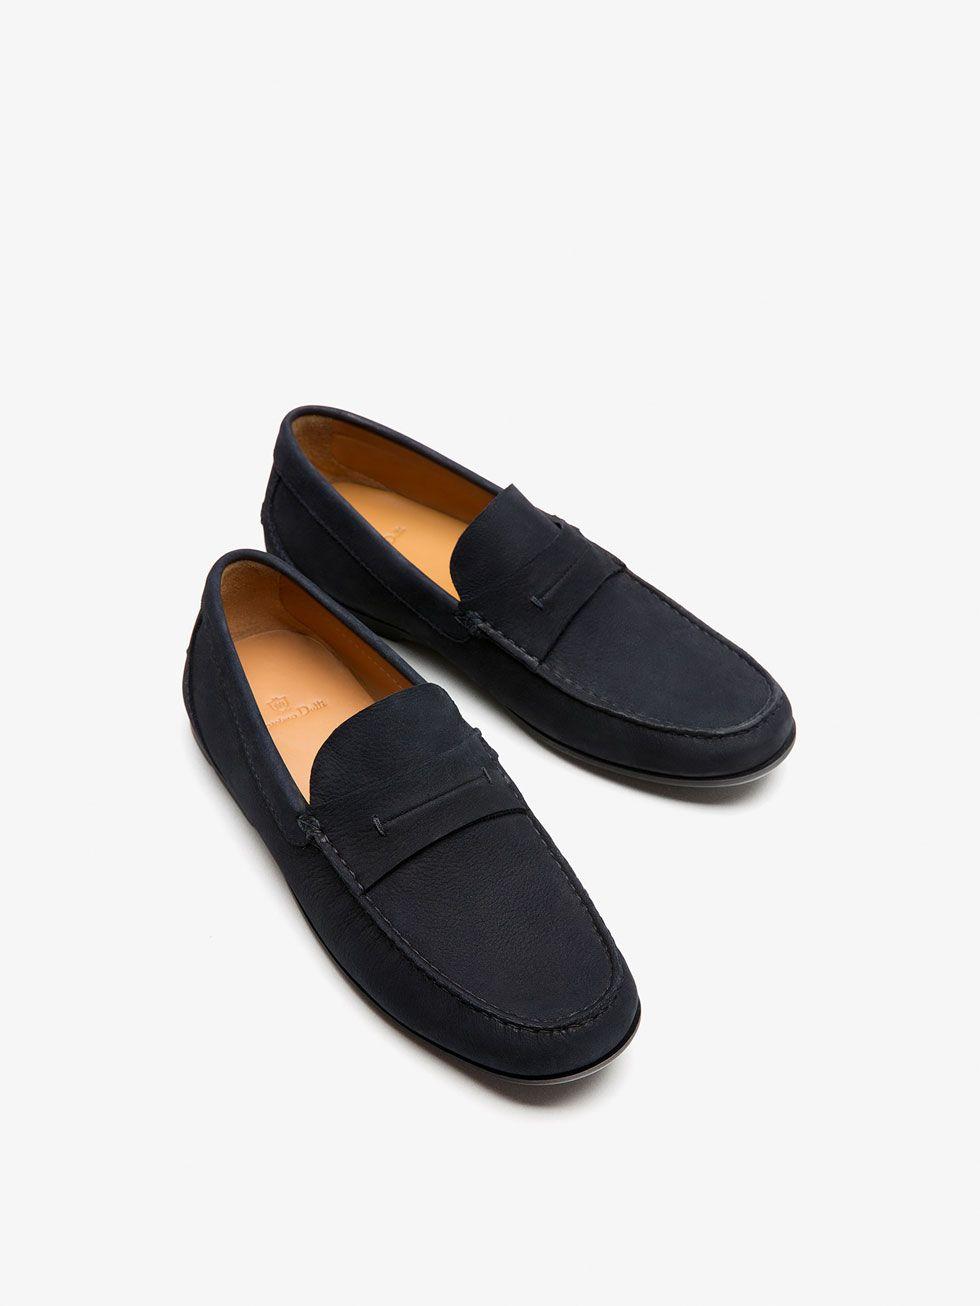 45ffdfa323c MOCASIN PIEL AZUL de HOMBRE - Zapatos - Ver todo de Massimo Dutti de  Primavera Verano 2017 por 69.95. ¡Elegancia natural!